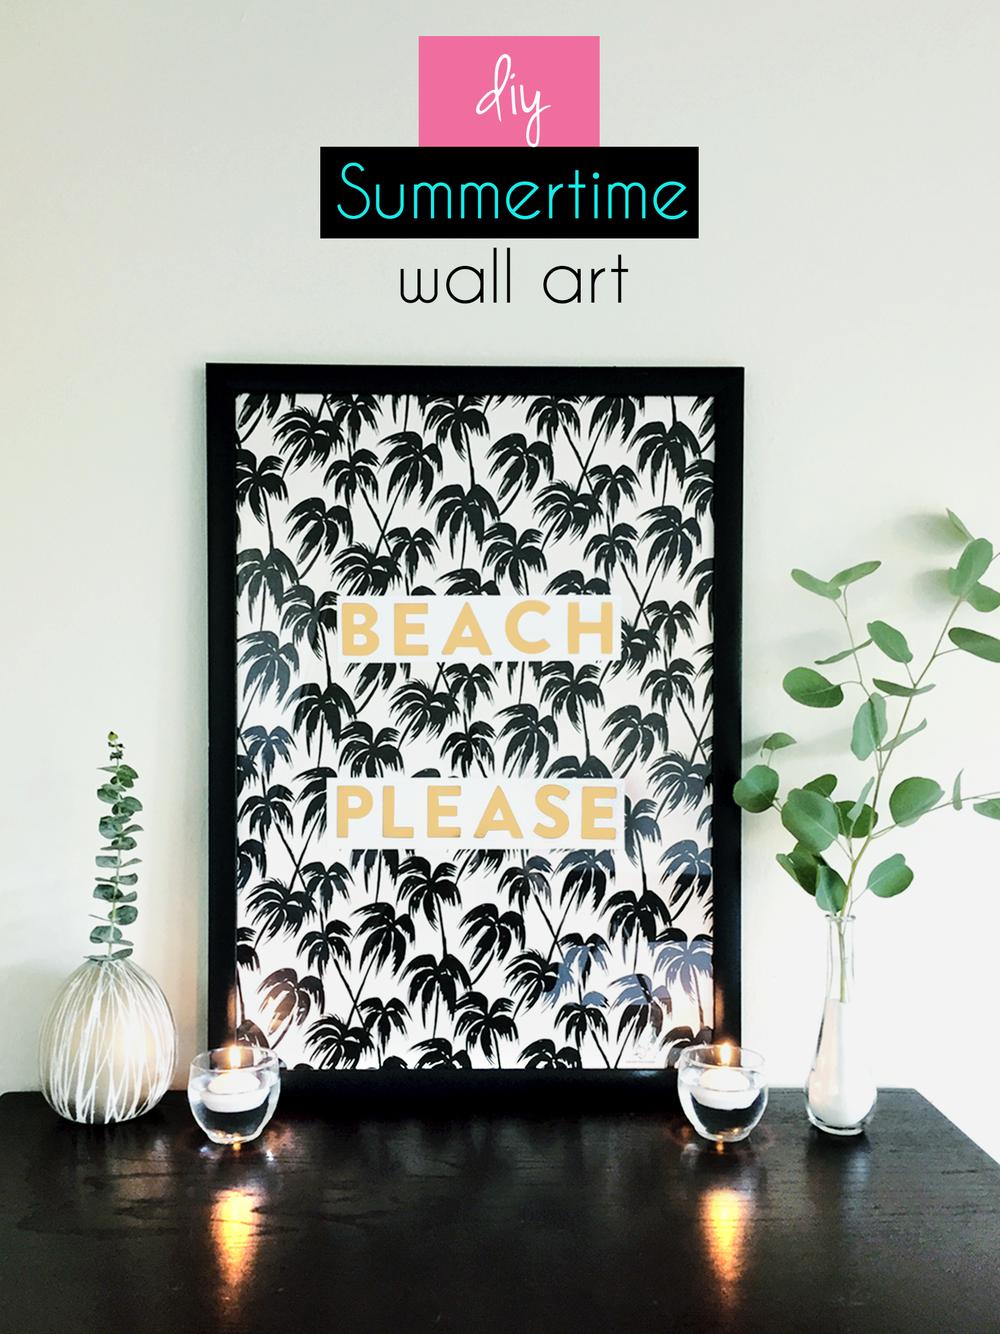 Diy Summertime Wall Art   Beach Please